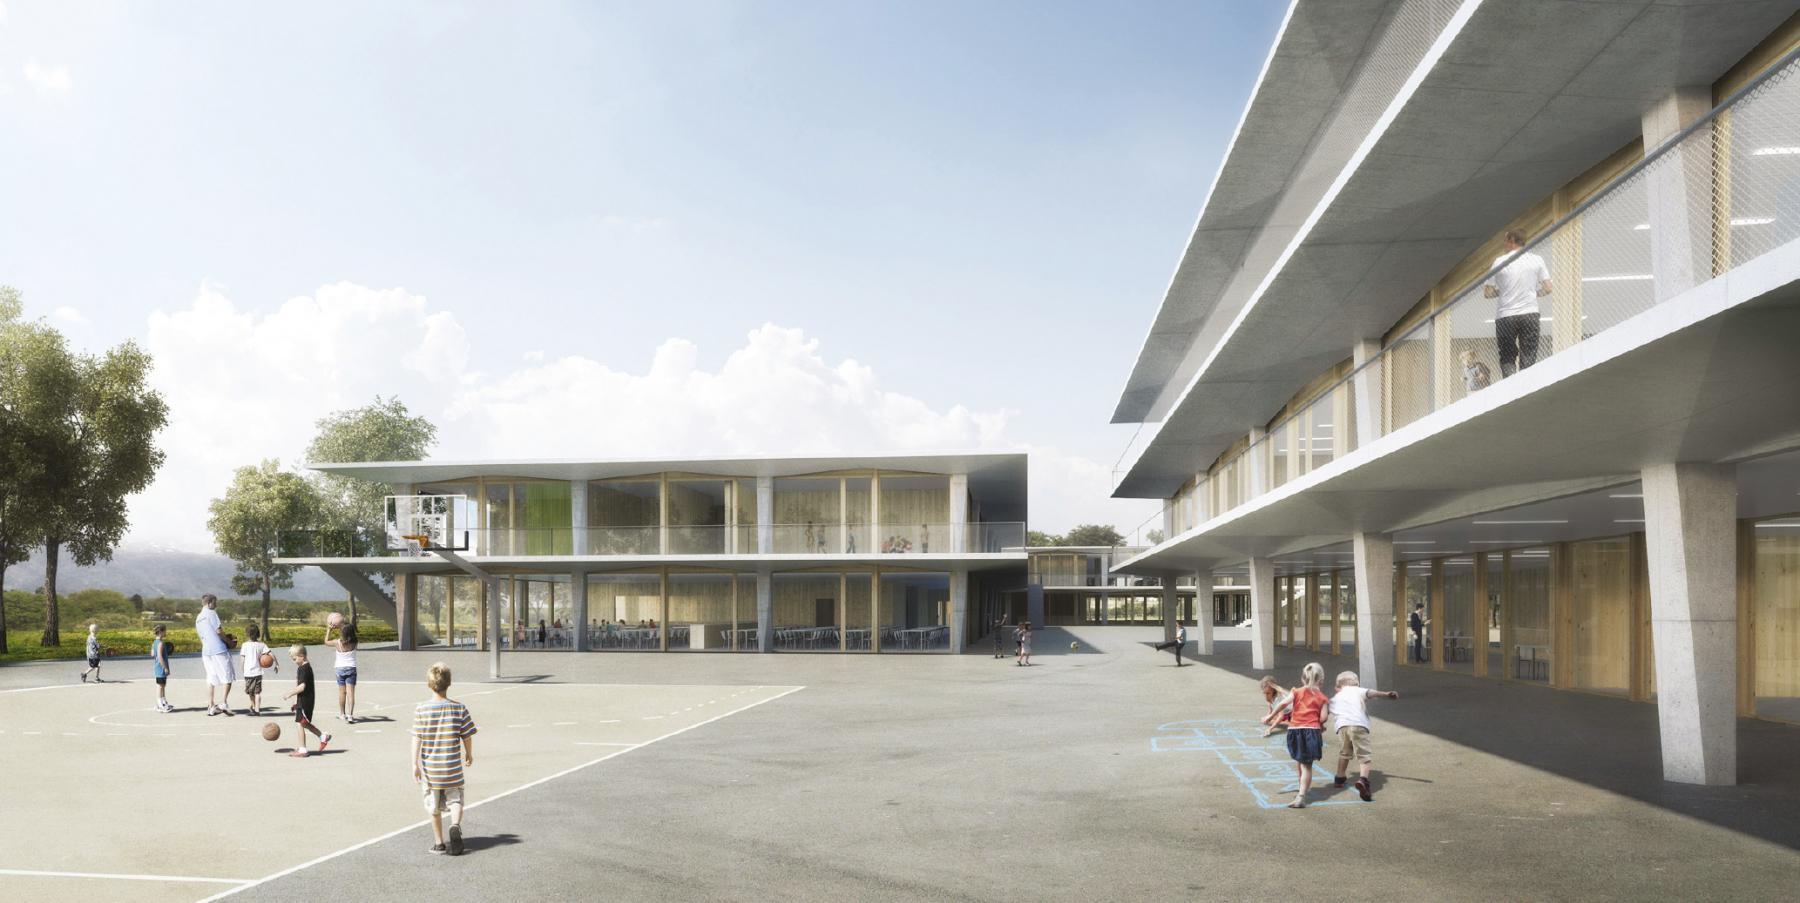 Equipements publics de l'Ecoquartier les Vergers, Meyrin, Widmann architectes, NIRWANA